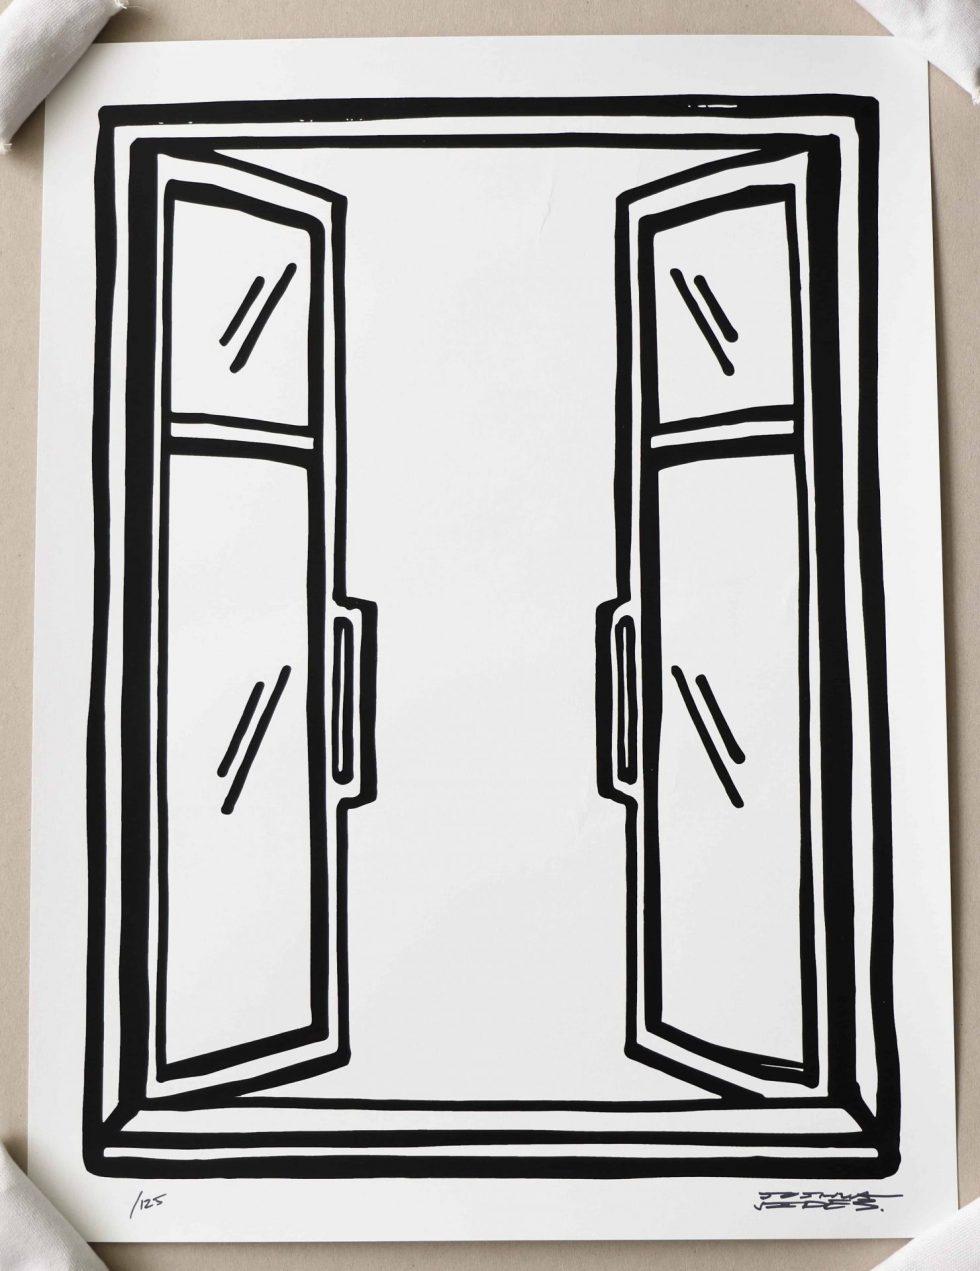 Lot #9545 – Joshua Vides New View Window Print Limited Edition Art Joshua Vides